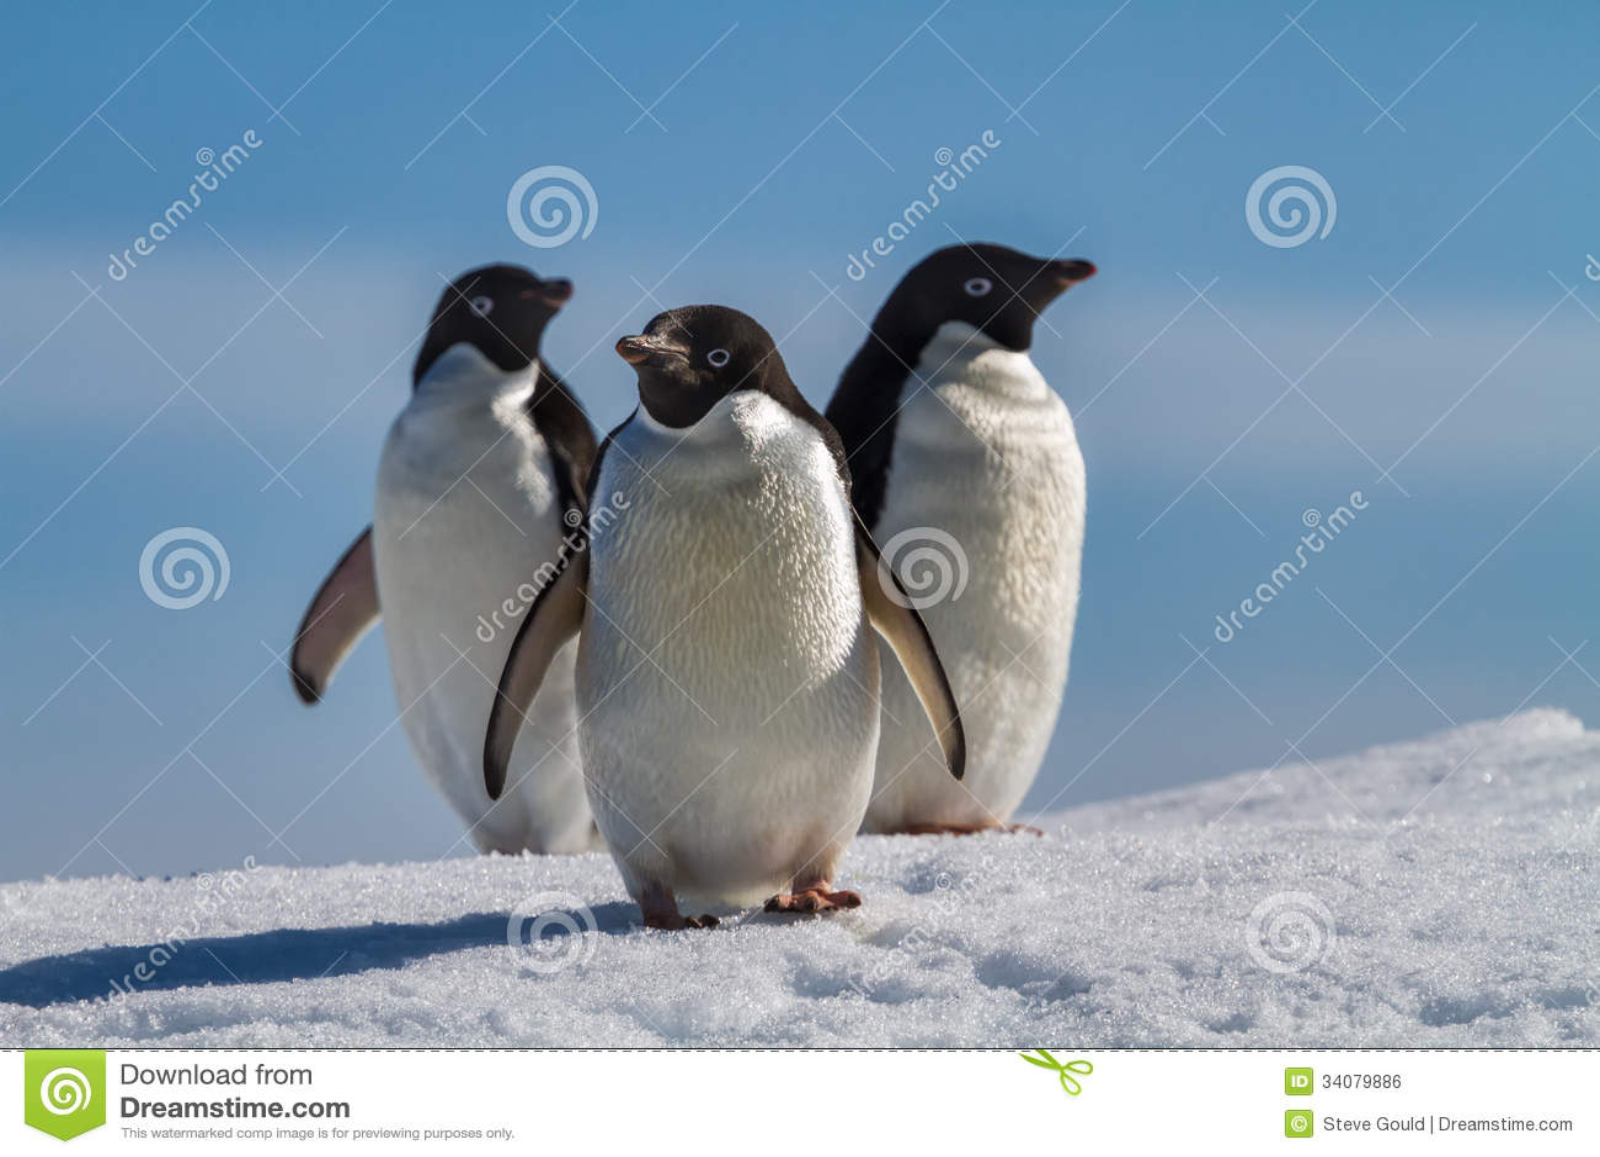 Three penguins on snow, Antarctica